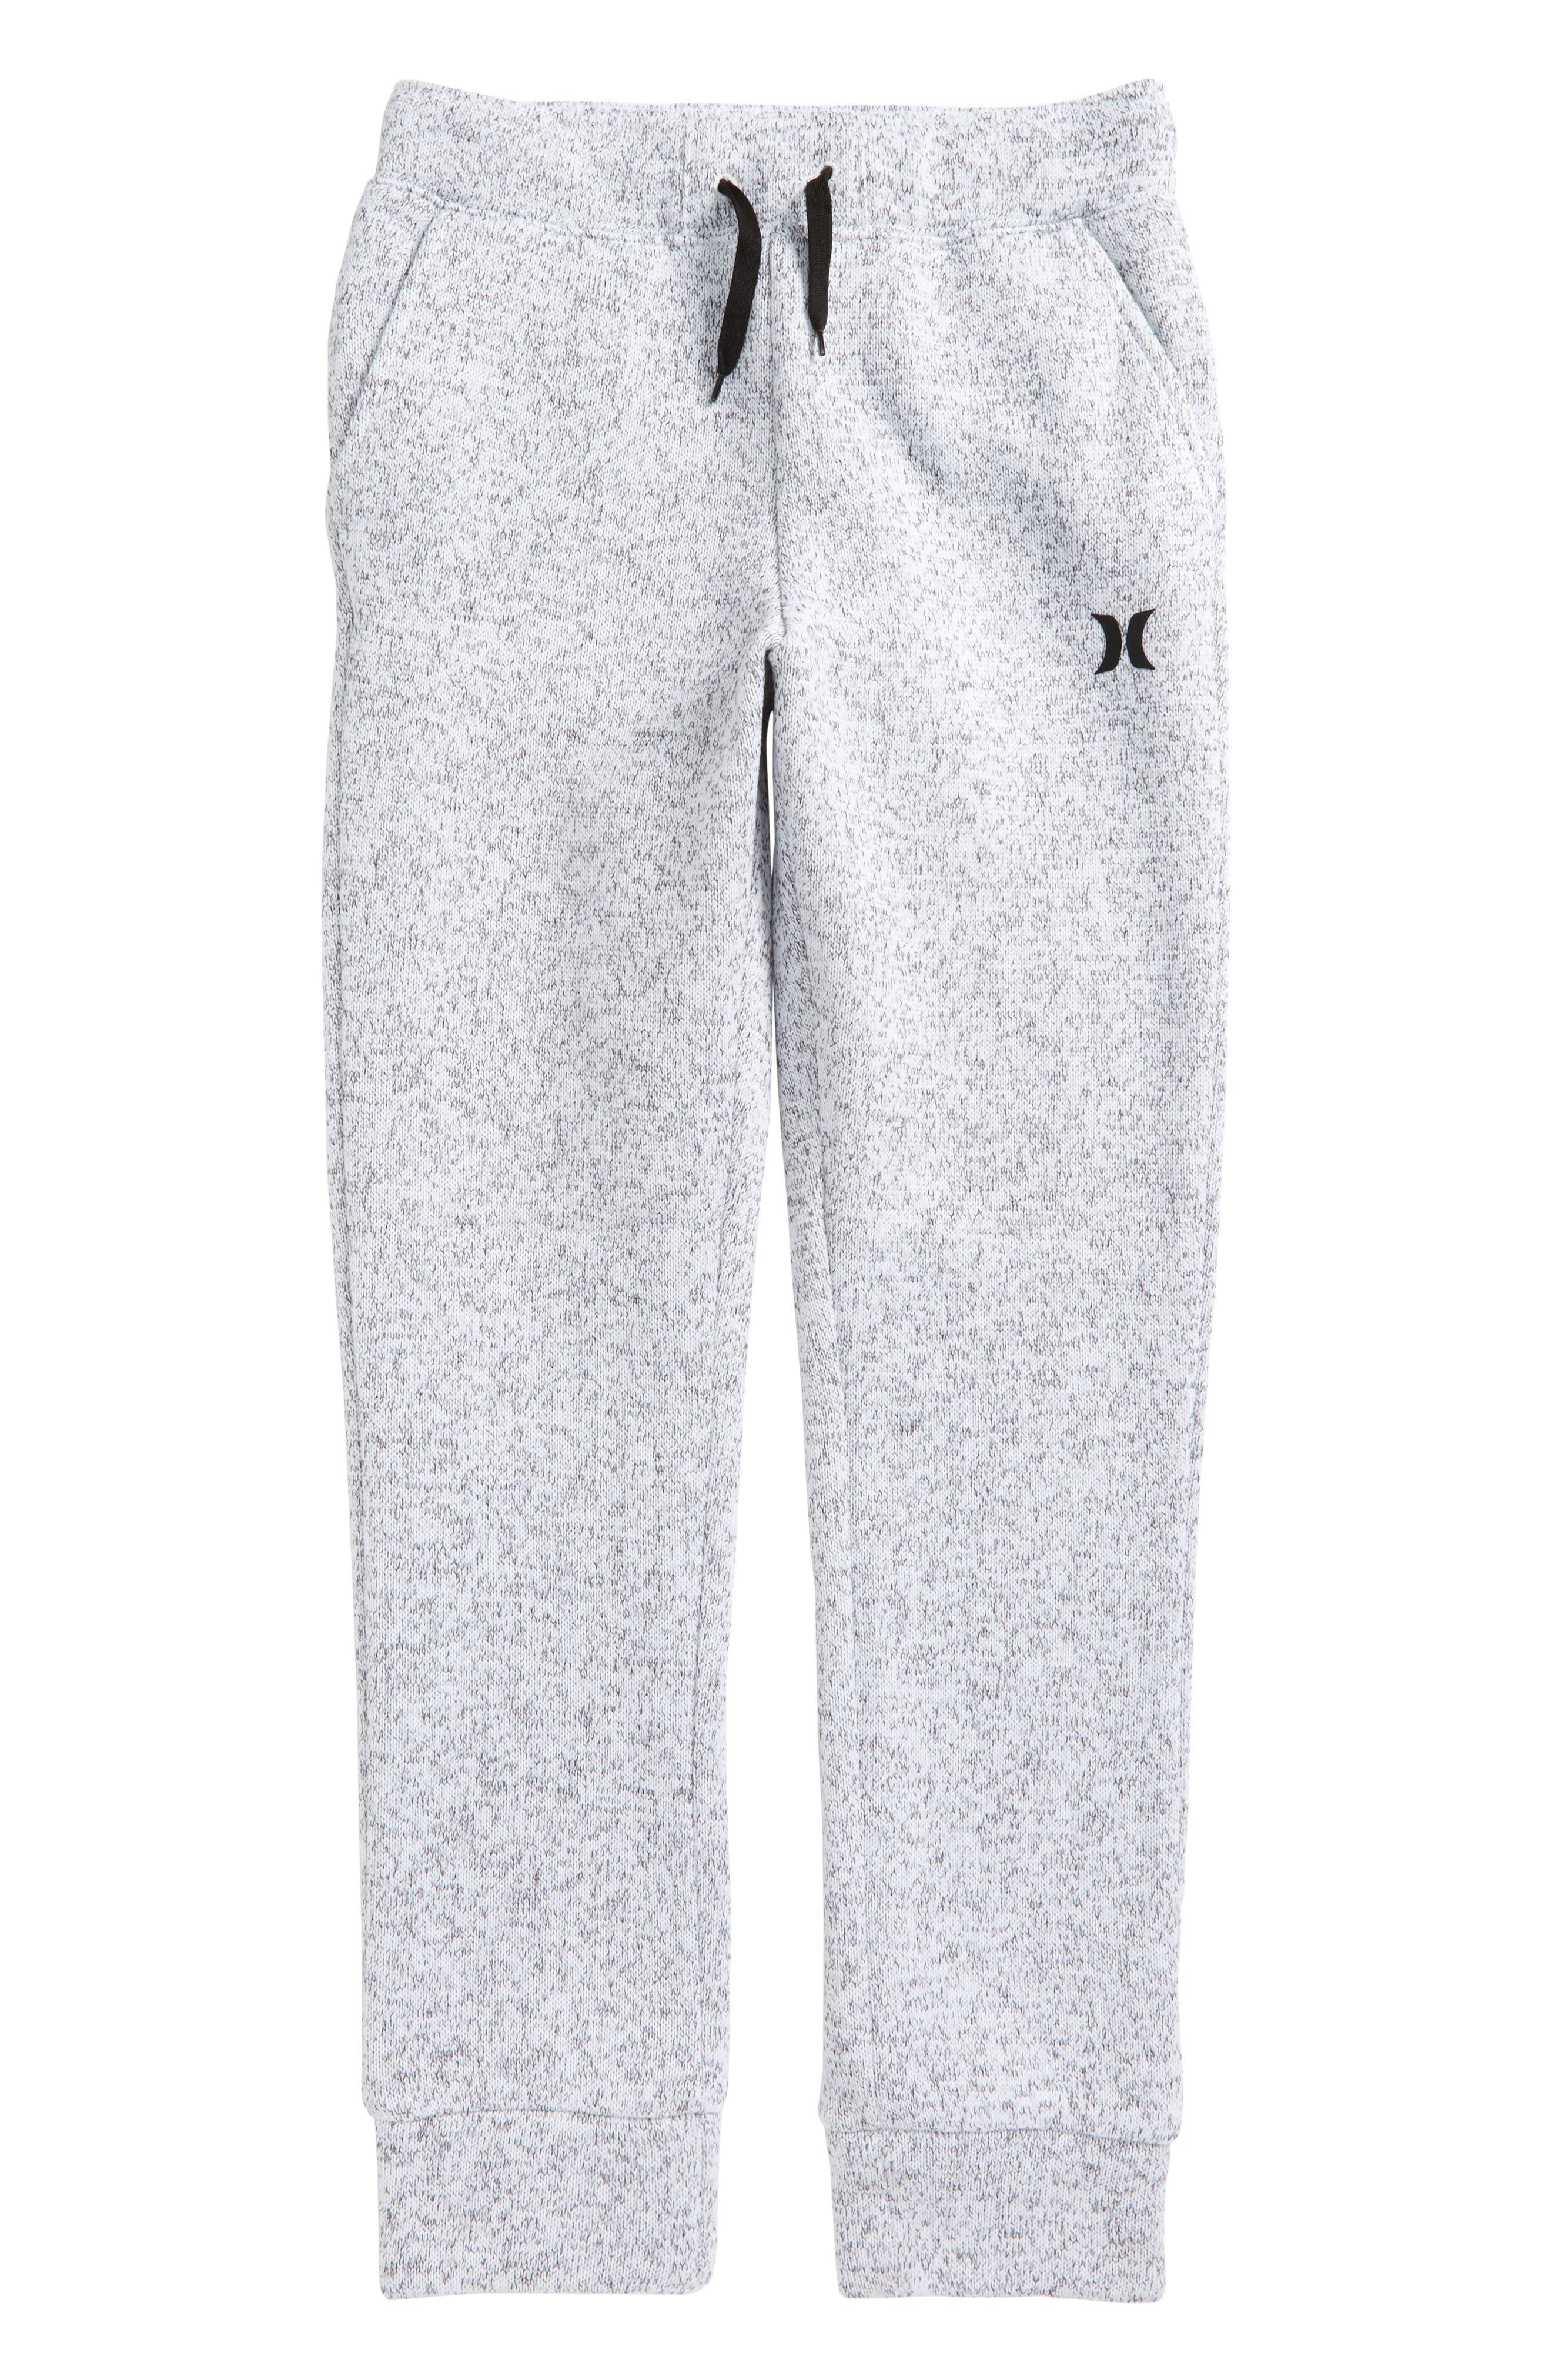 Sweater Knit Fleece Pants,                         Main,                         color, White